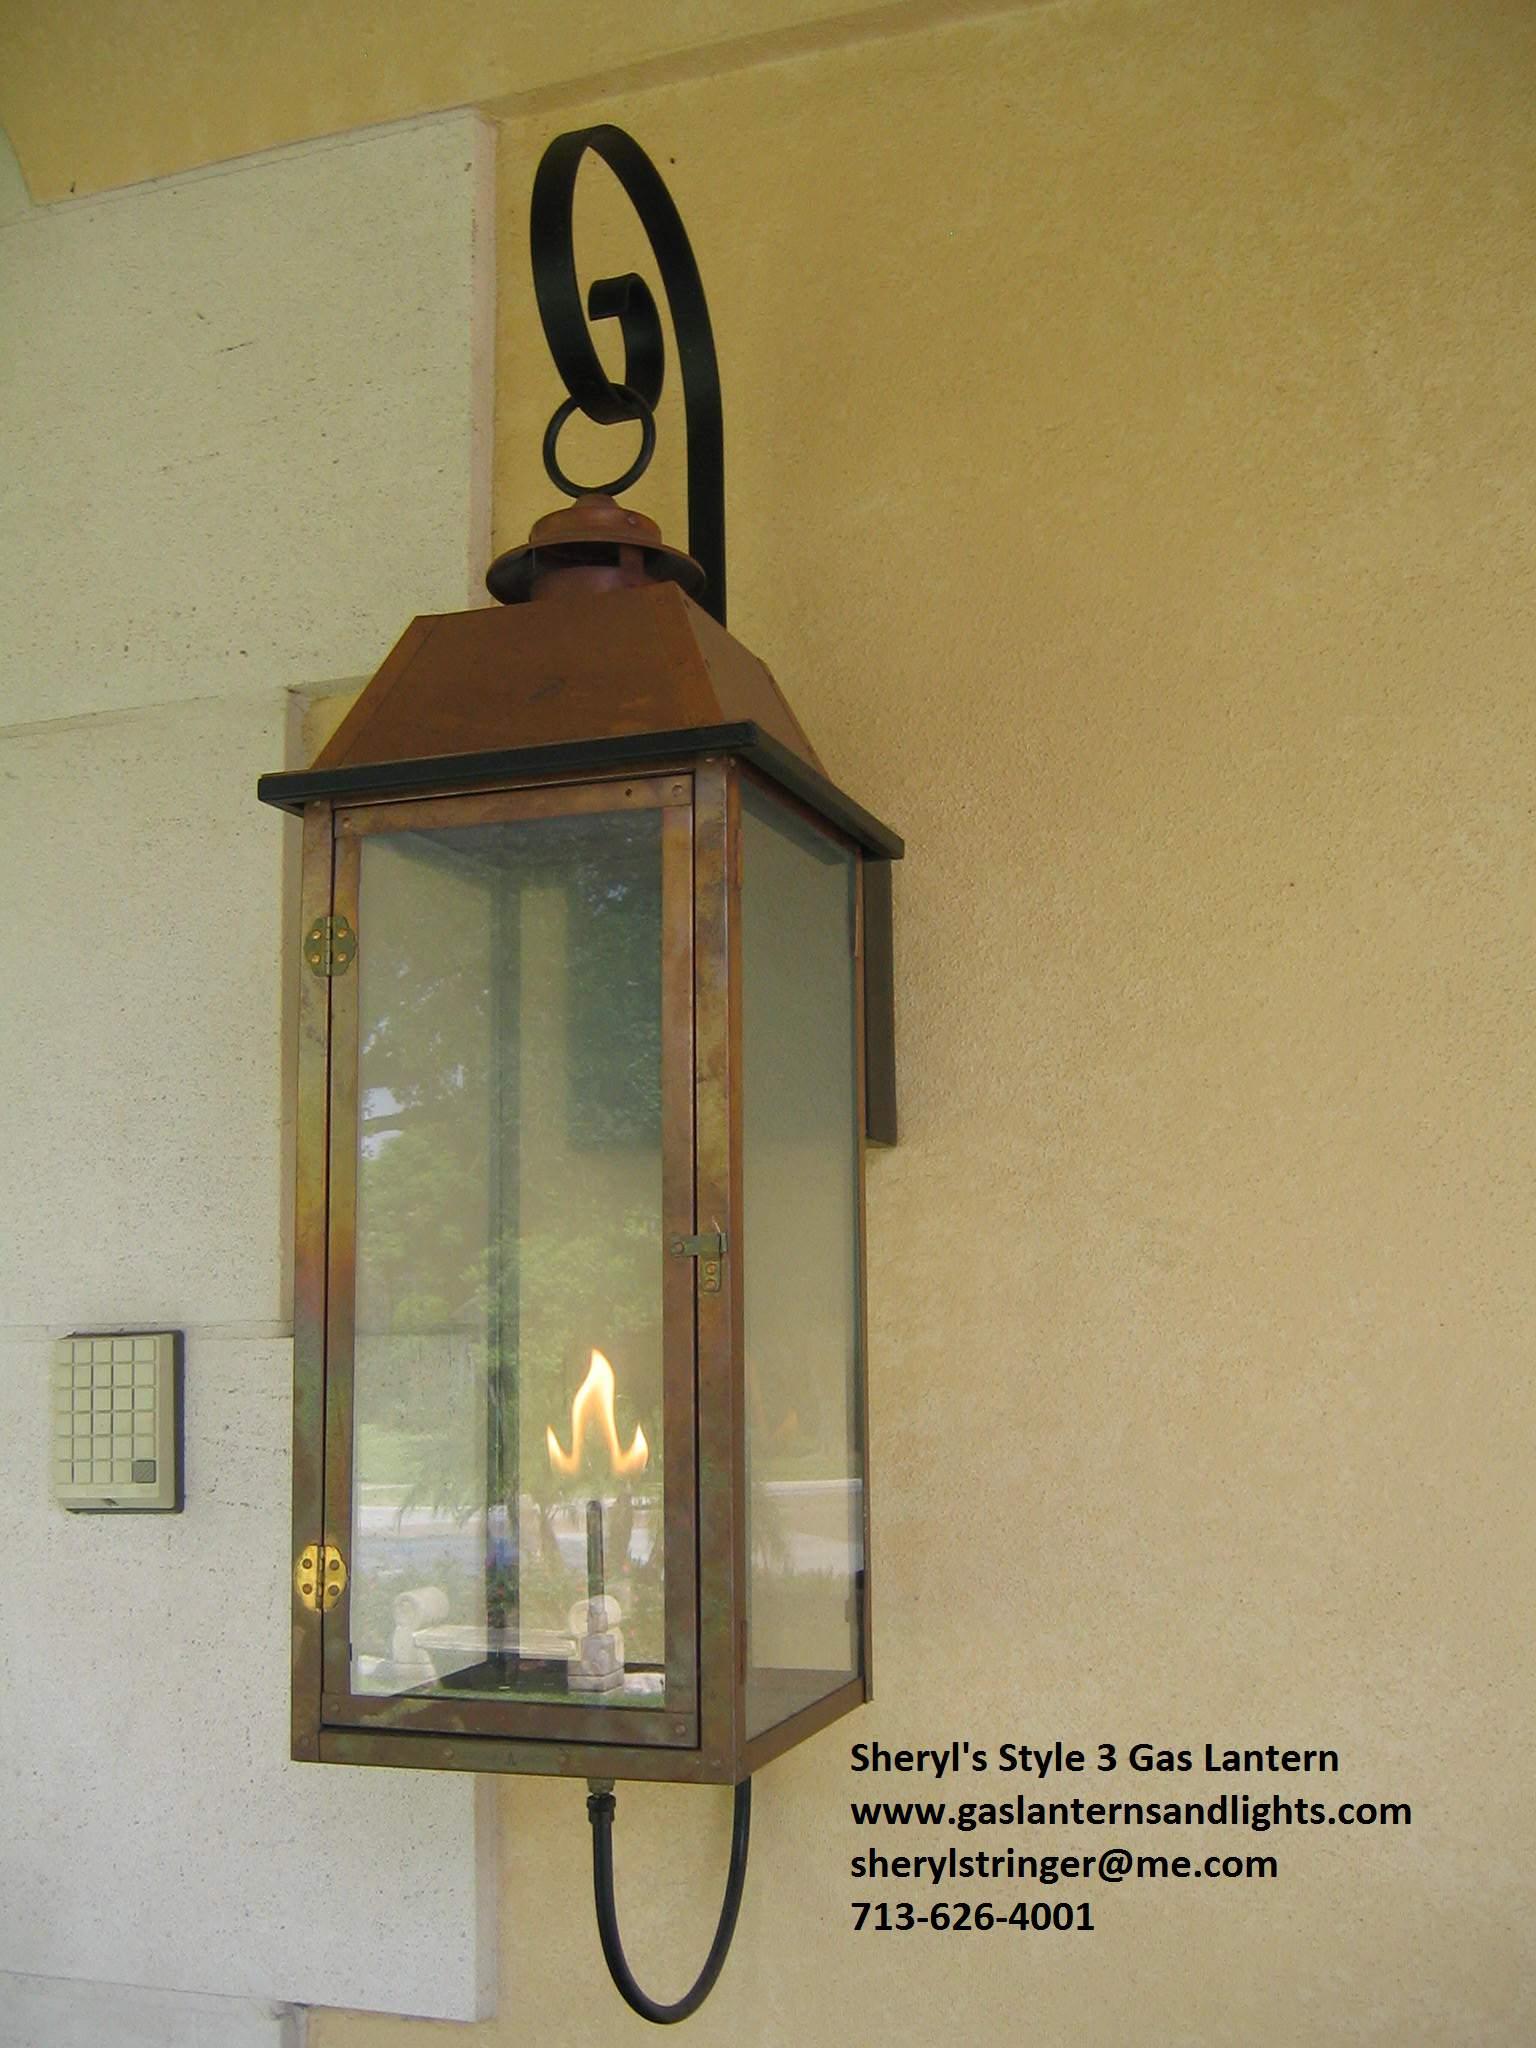 Sheryl's Style 3 Transitional Gas Lantern